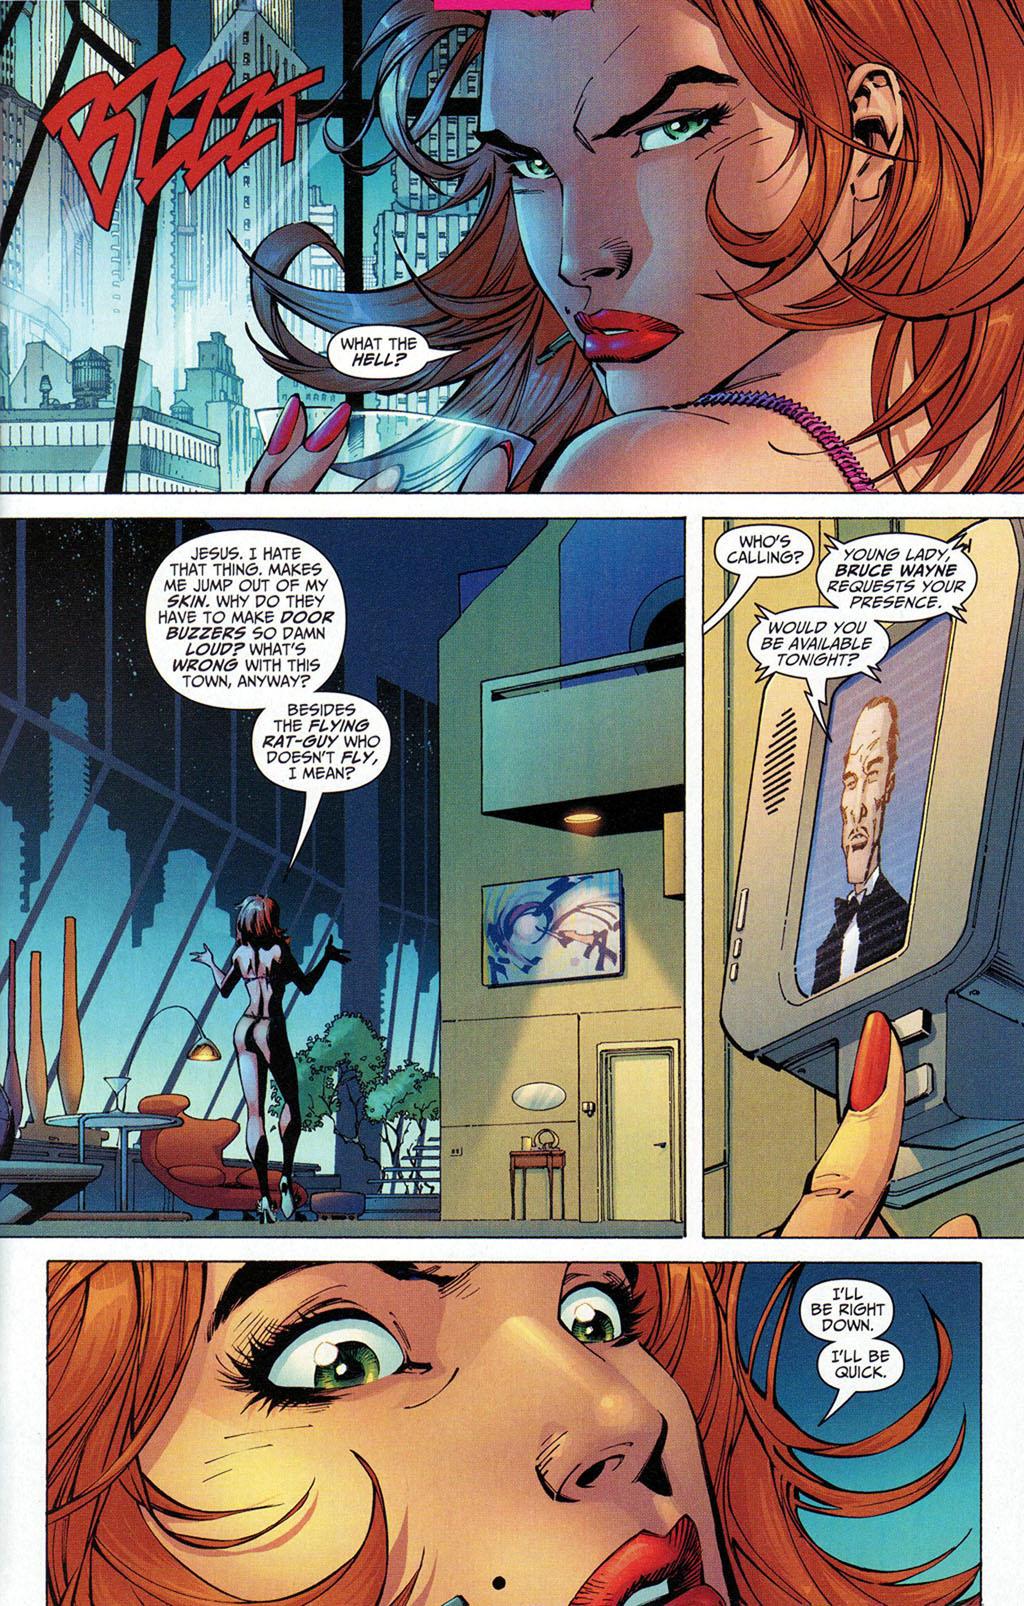 batman and sex catwoman have Blue dragon zola